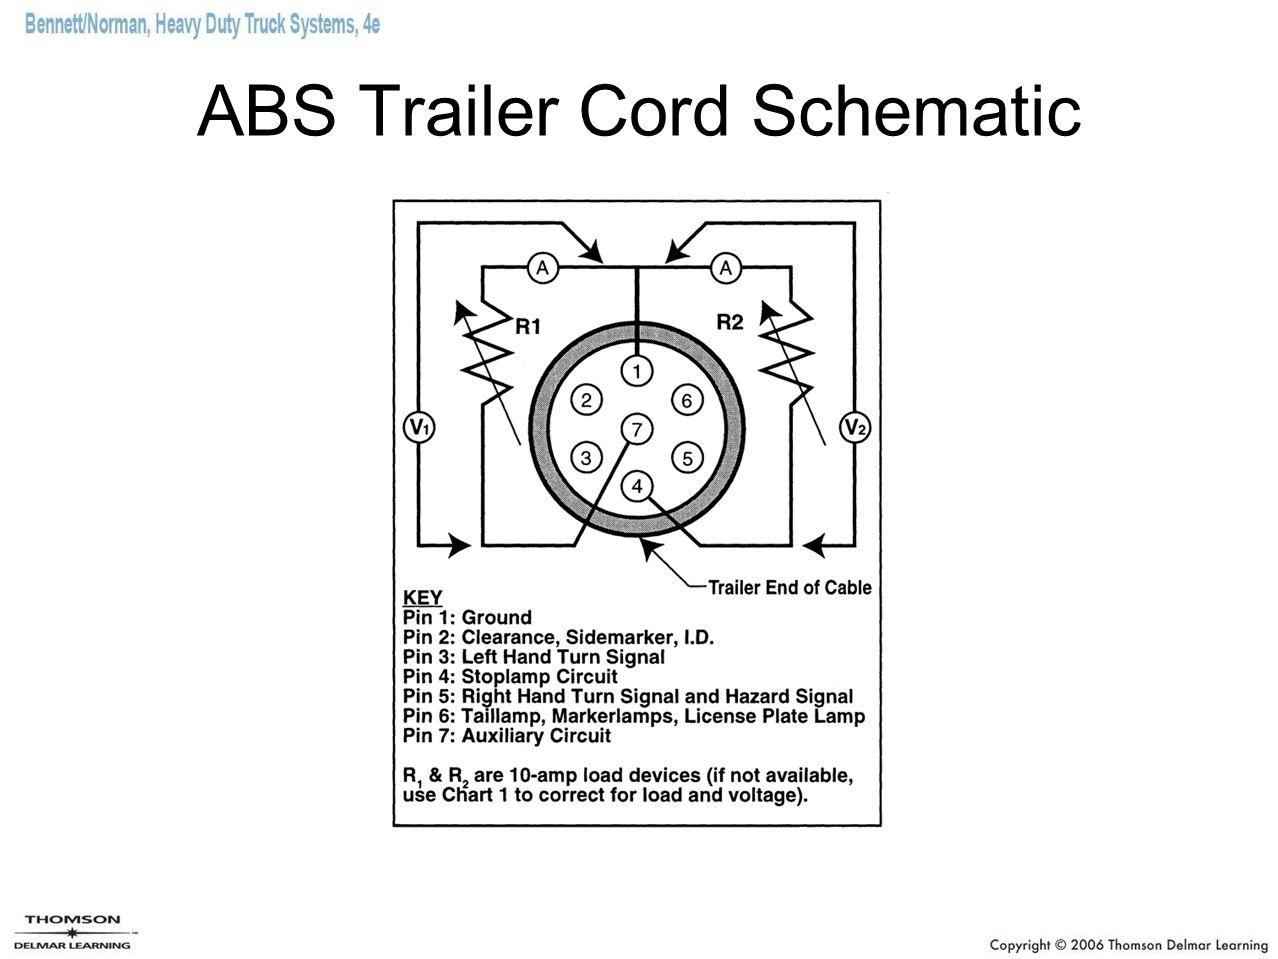 ABS Trailer Cord Schematic